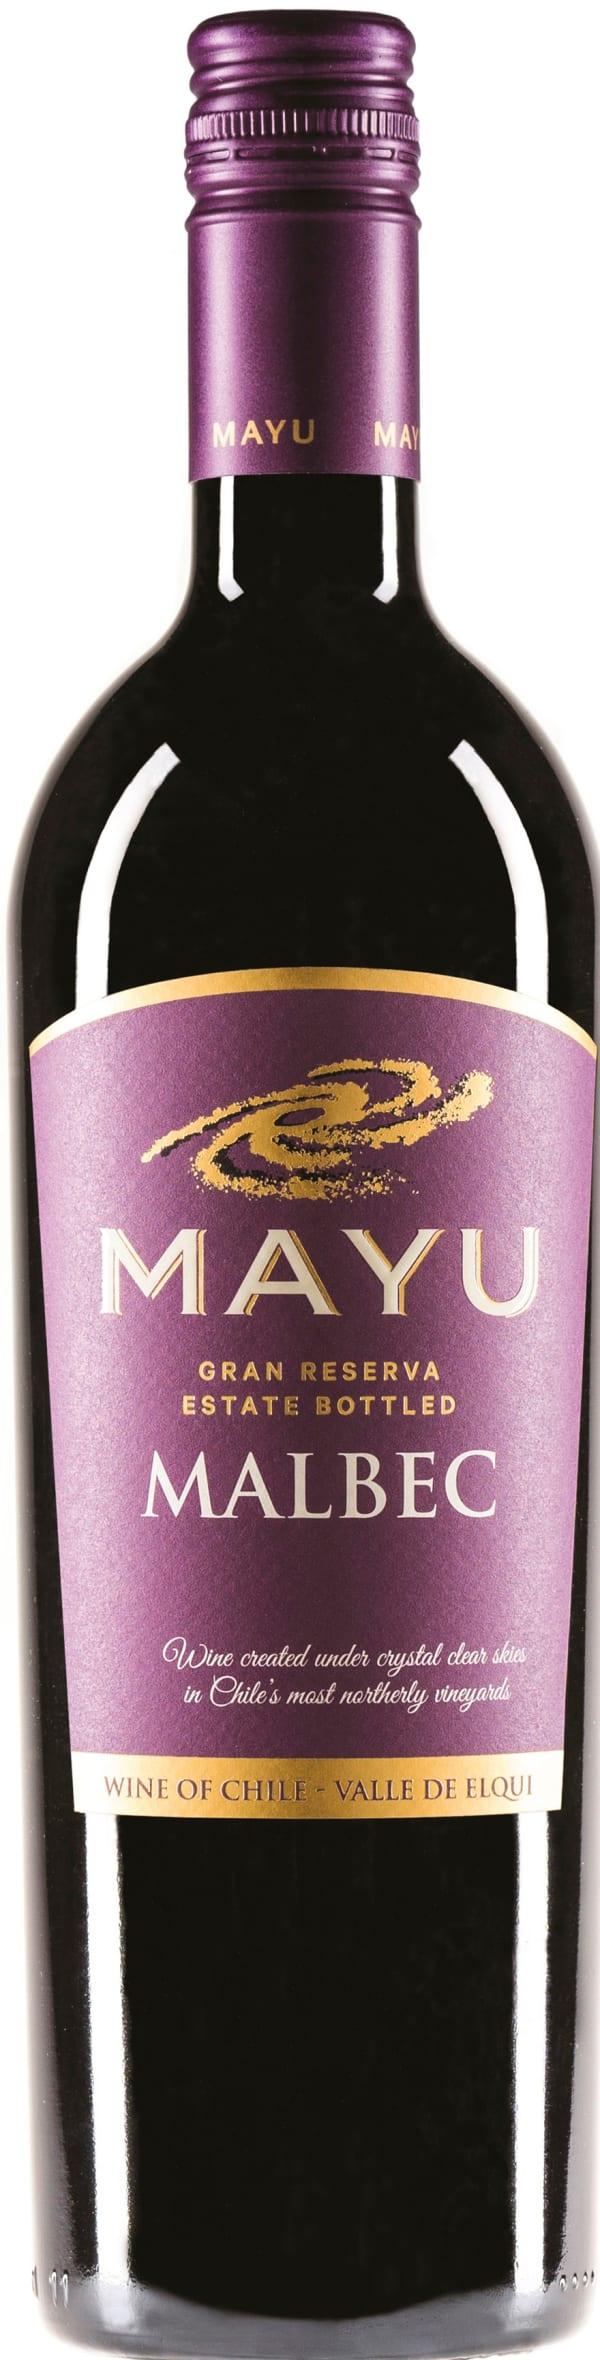 Mayu Gran Reserva Malbec 2017